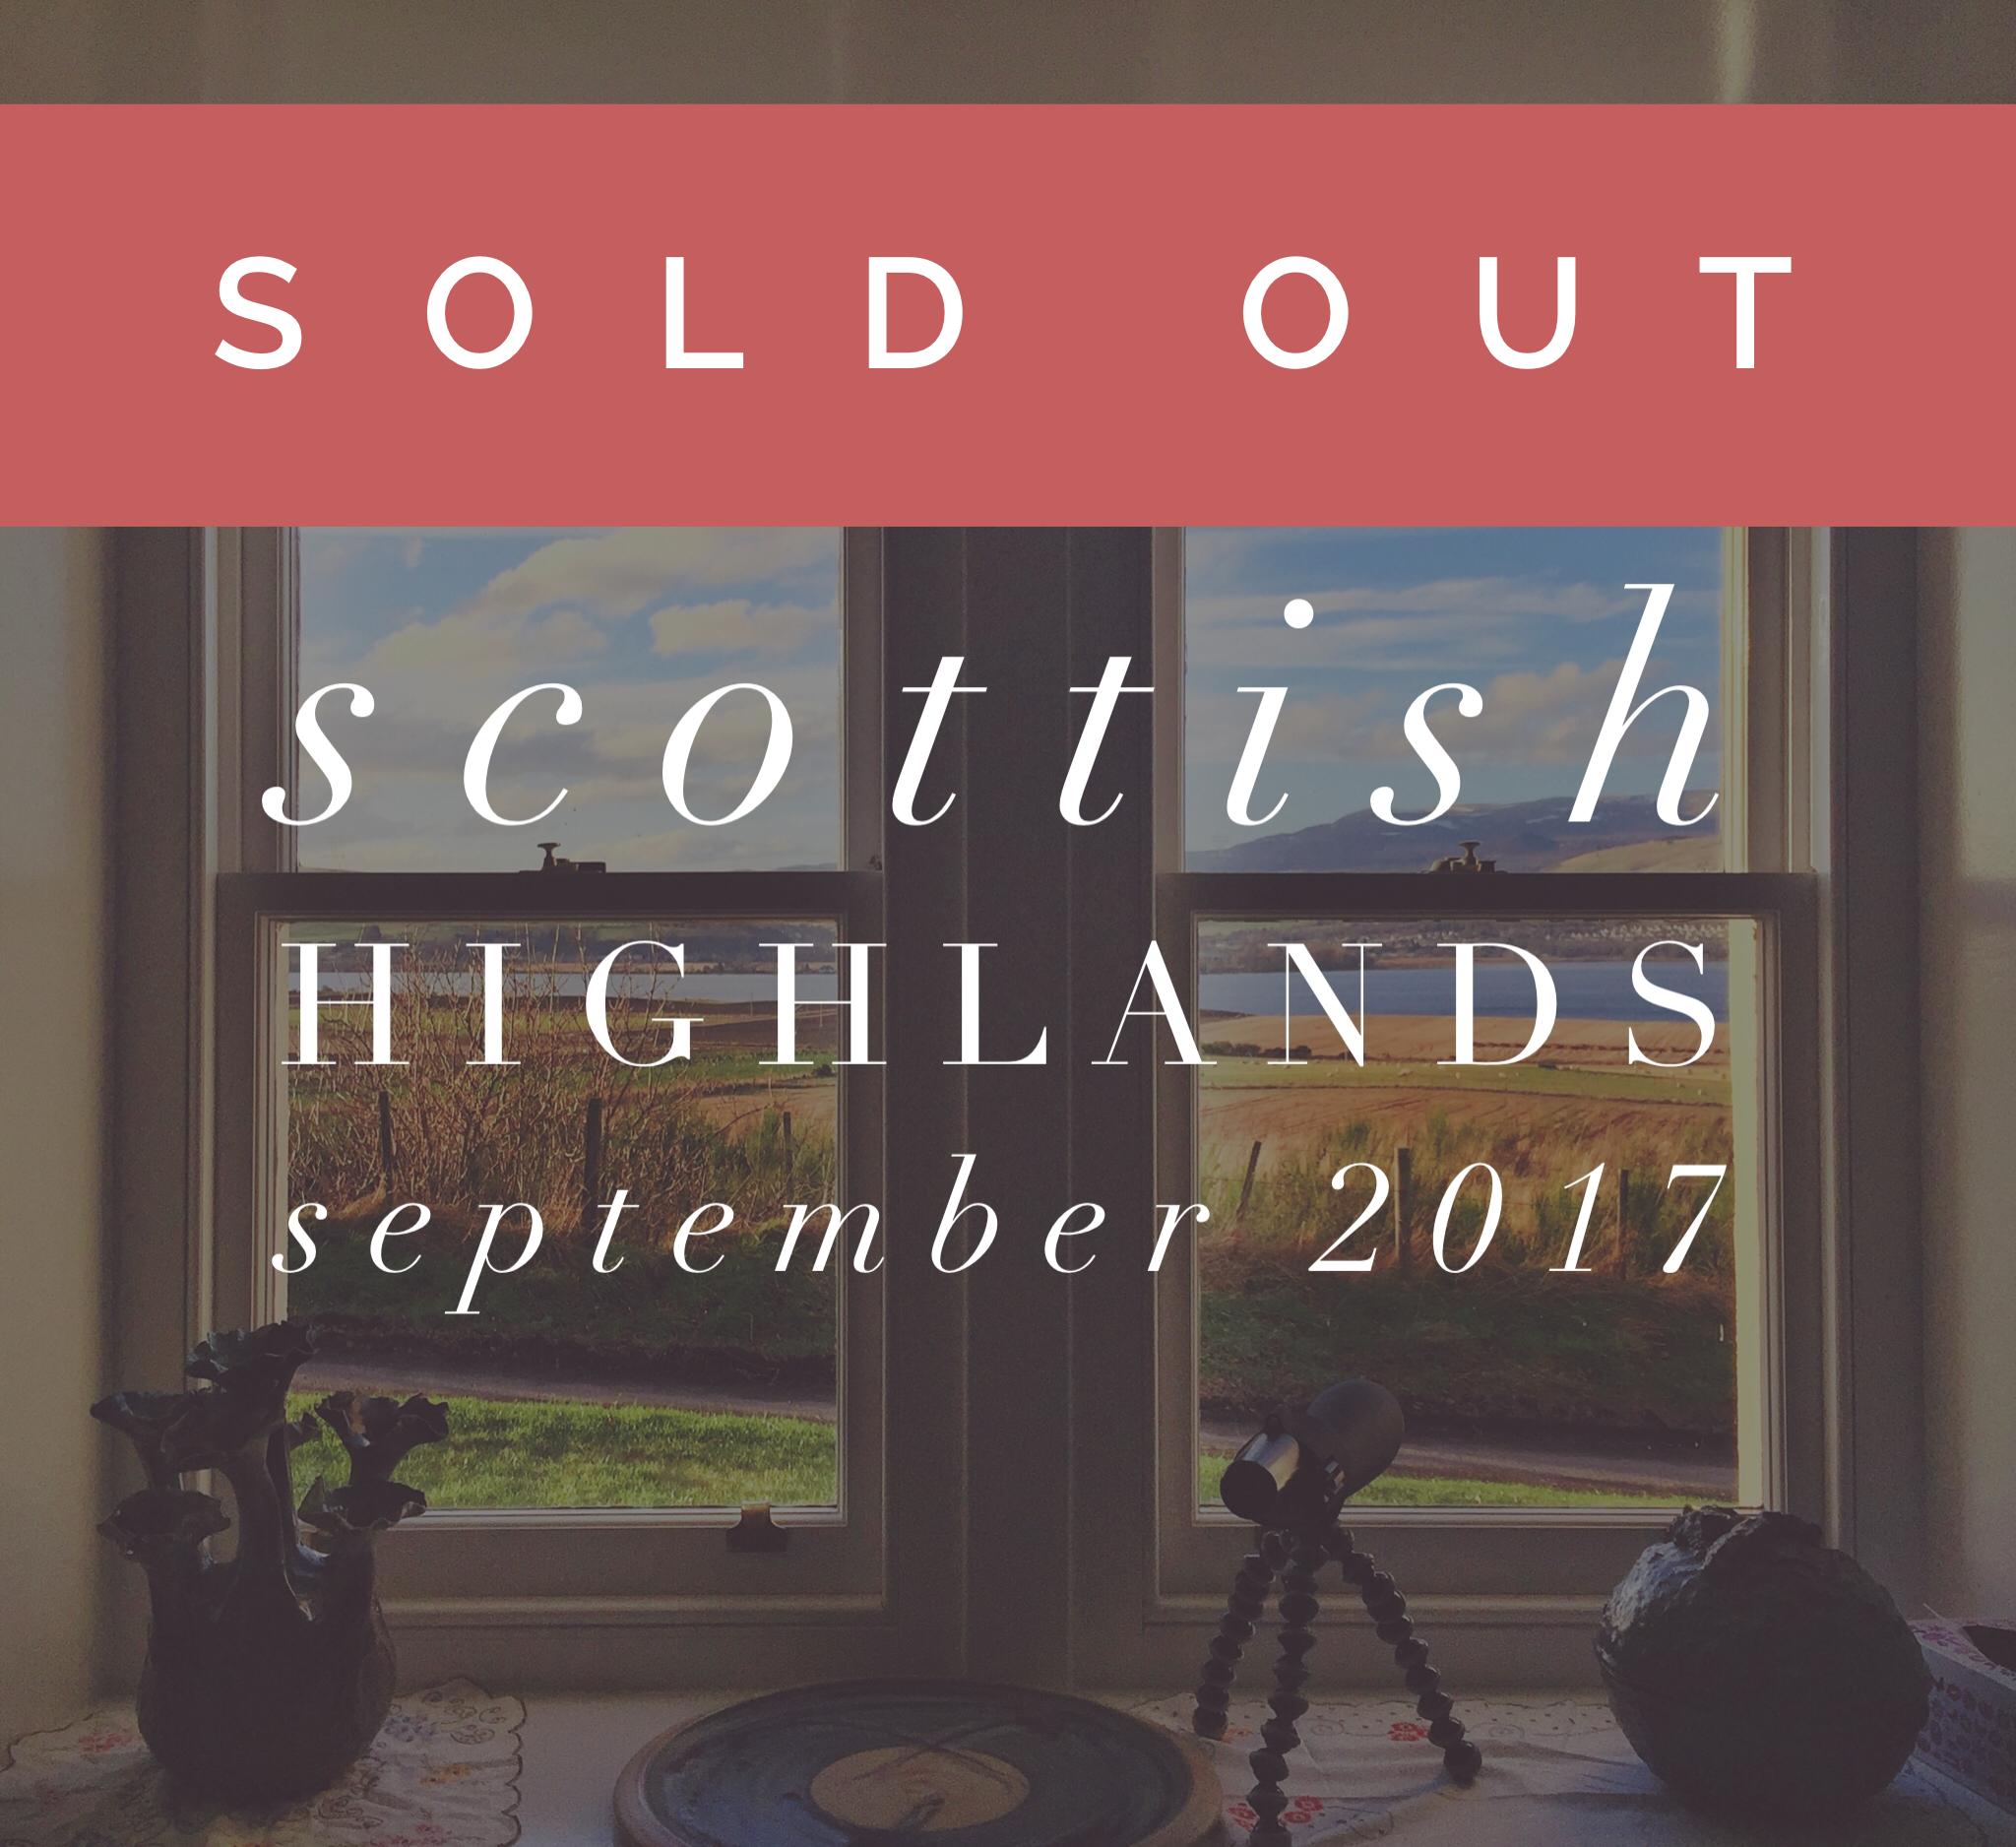 Scottish Highlands vegan yoga retreat - Scotland, September 2017 - all-inclusive - UK wellness holiday